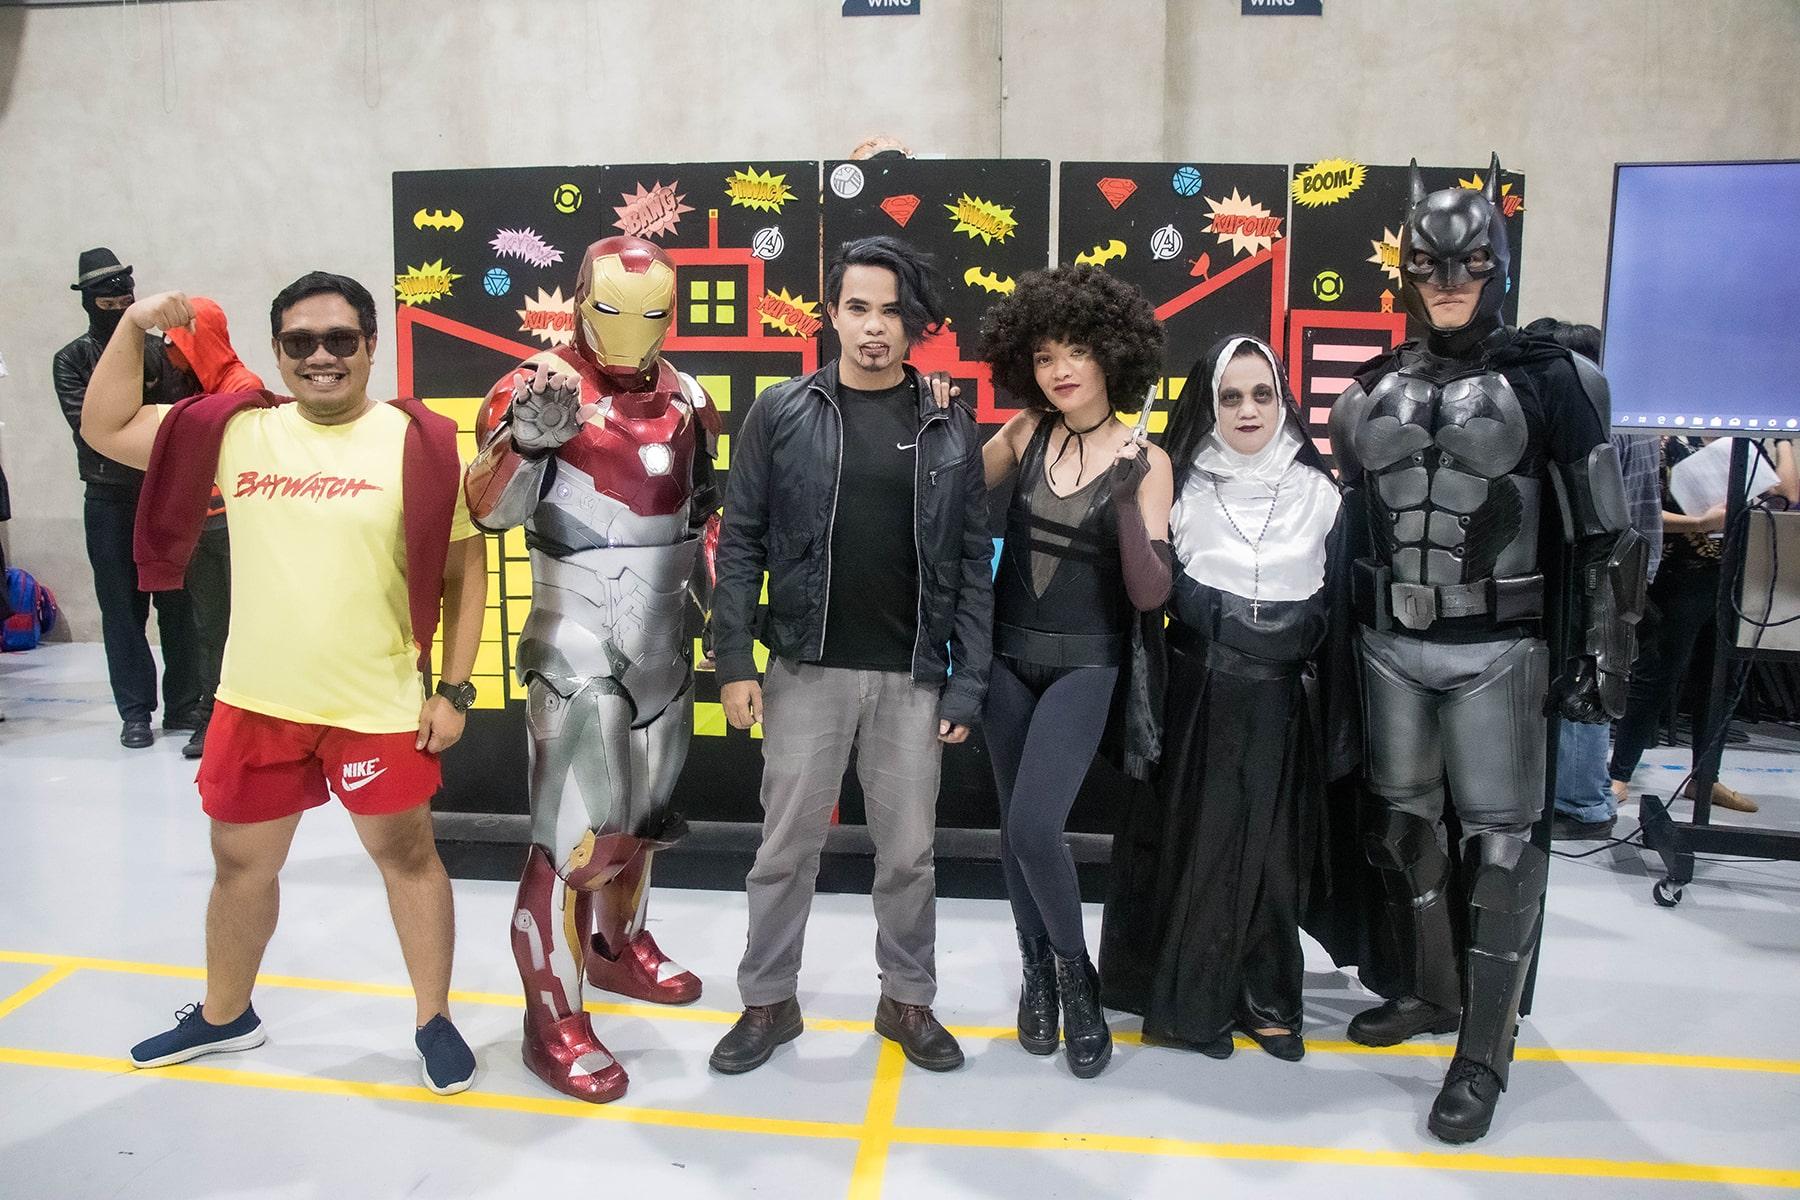 CIIT's Halloween Costume Party